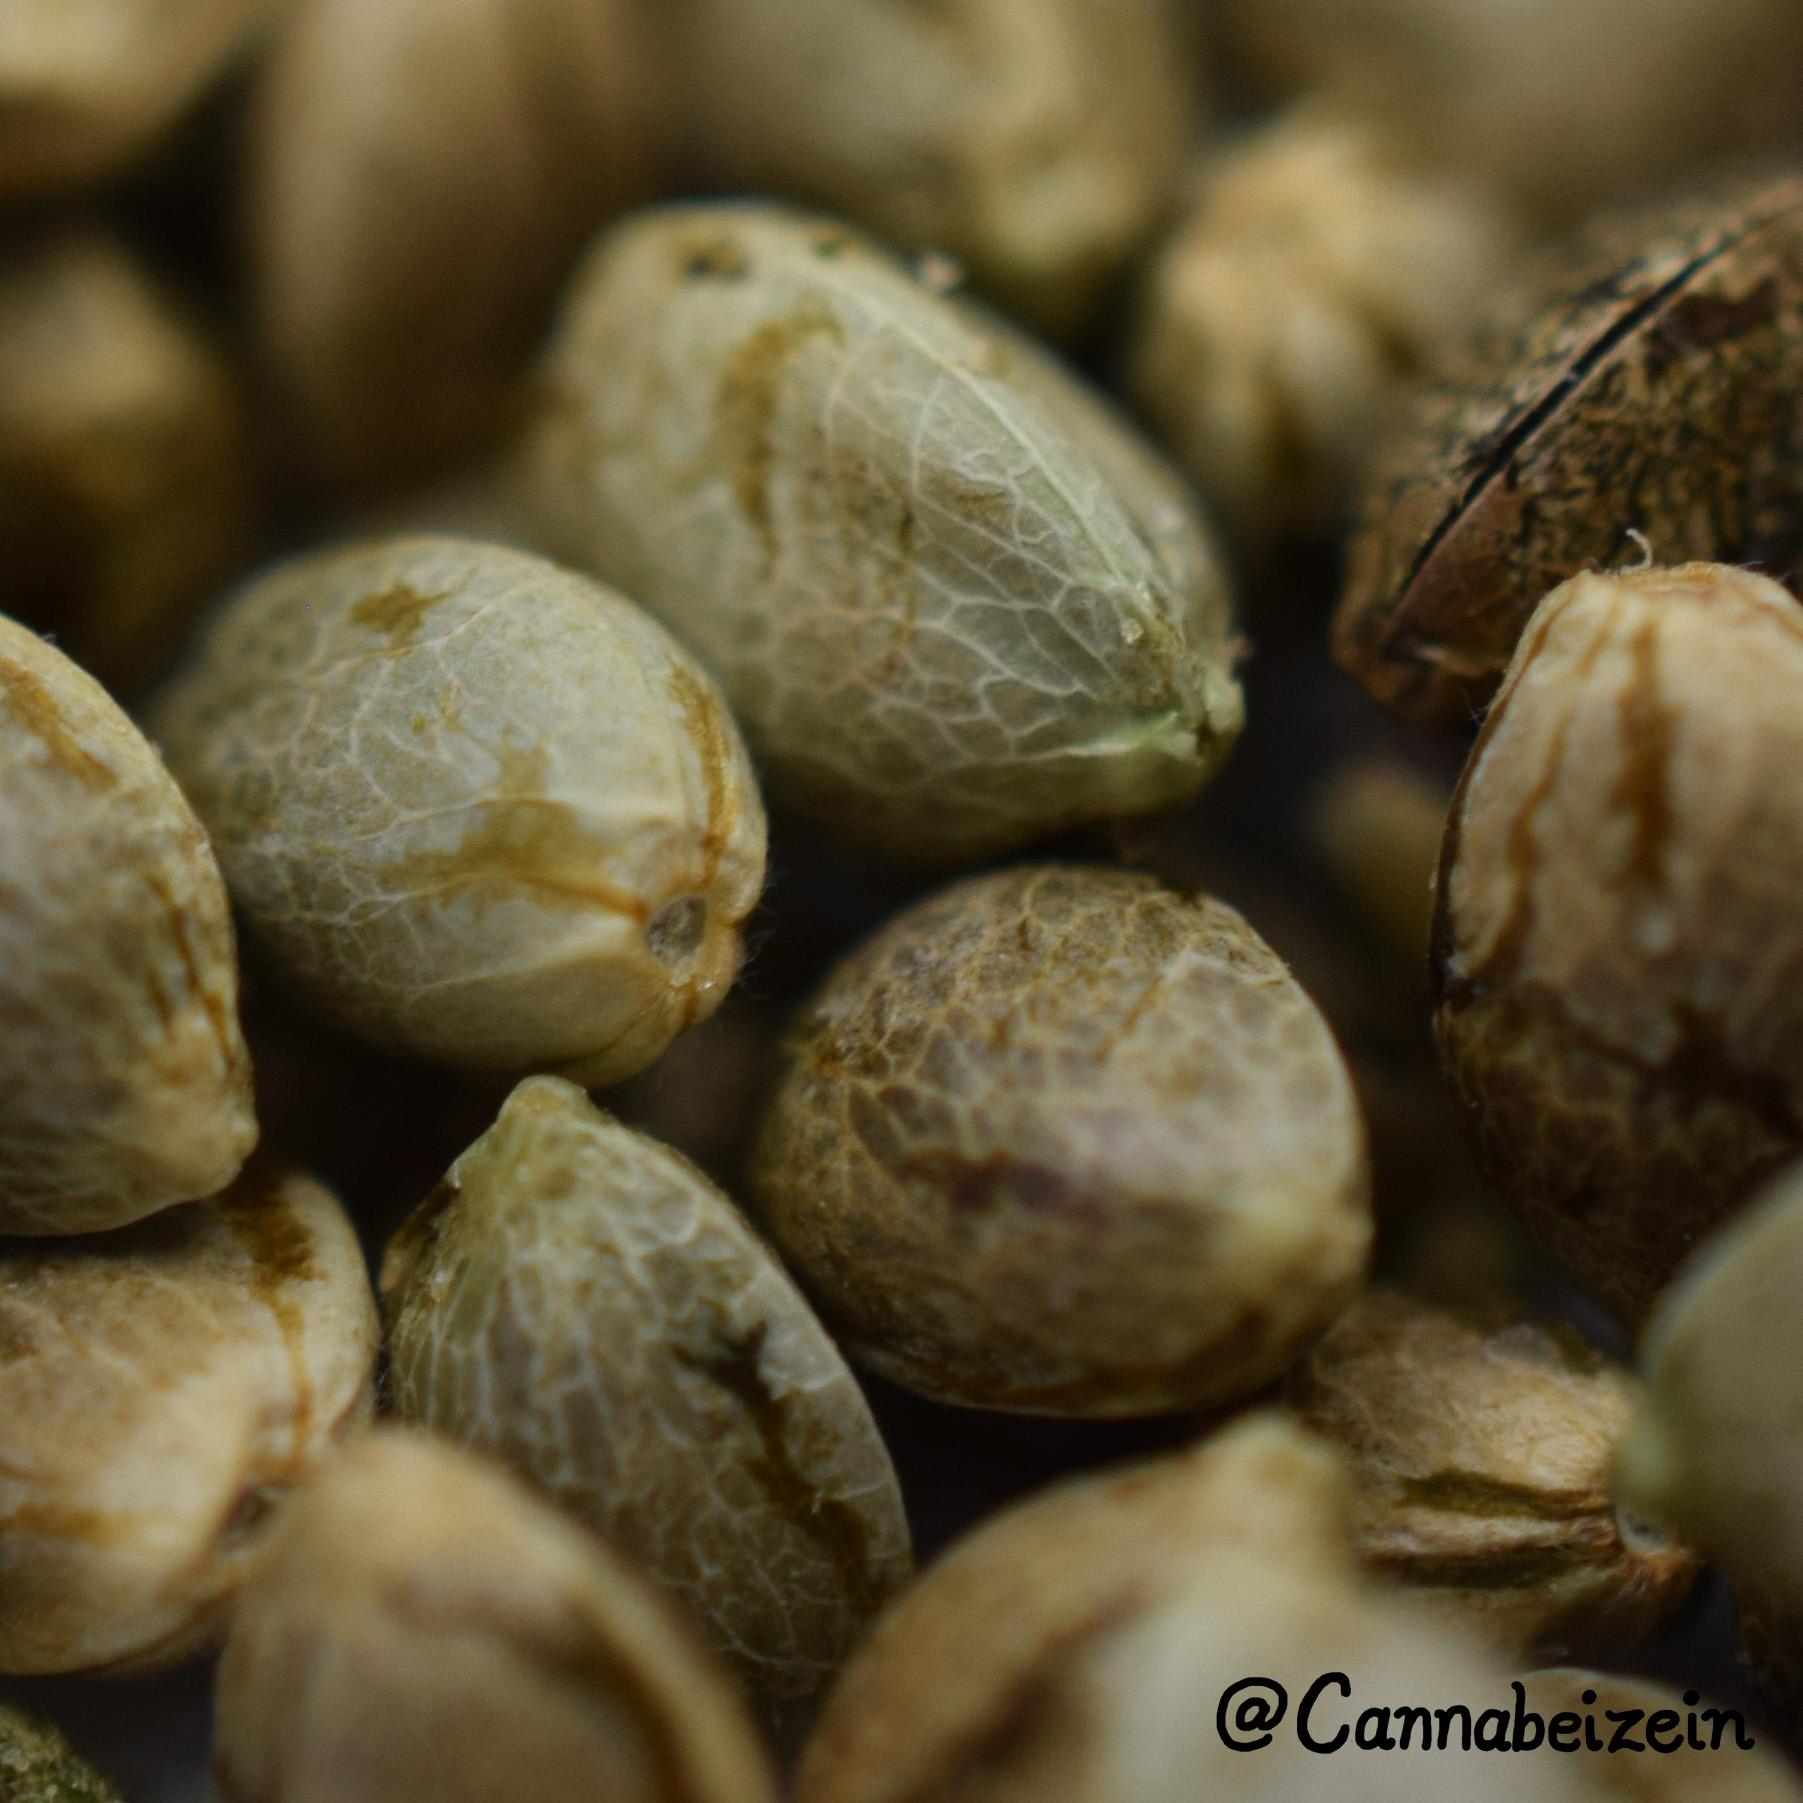 Cannabeizein 0226 - Mystery Mix Seeds - DSC_0819 copy.jpg